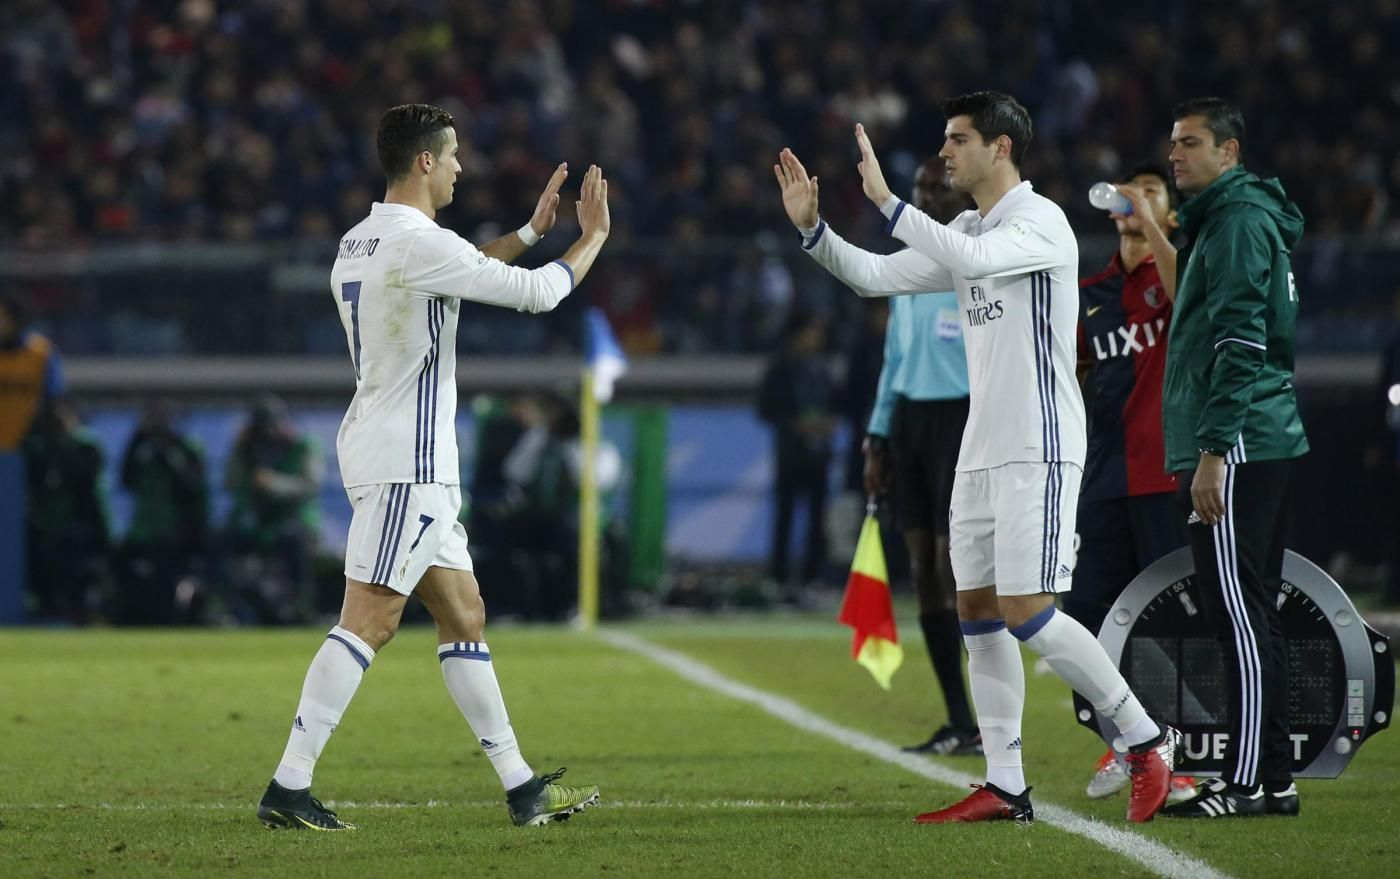 Mondiale per club, Real campione: tris di Ronaldo